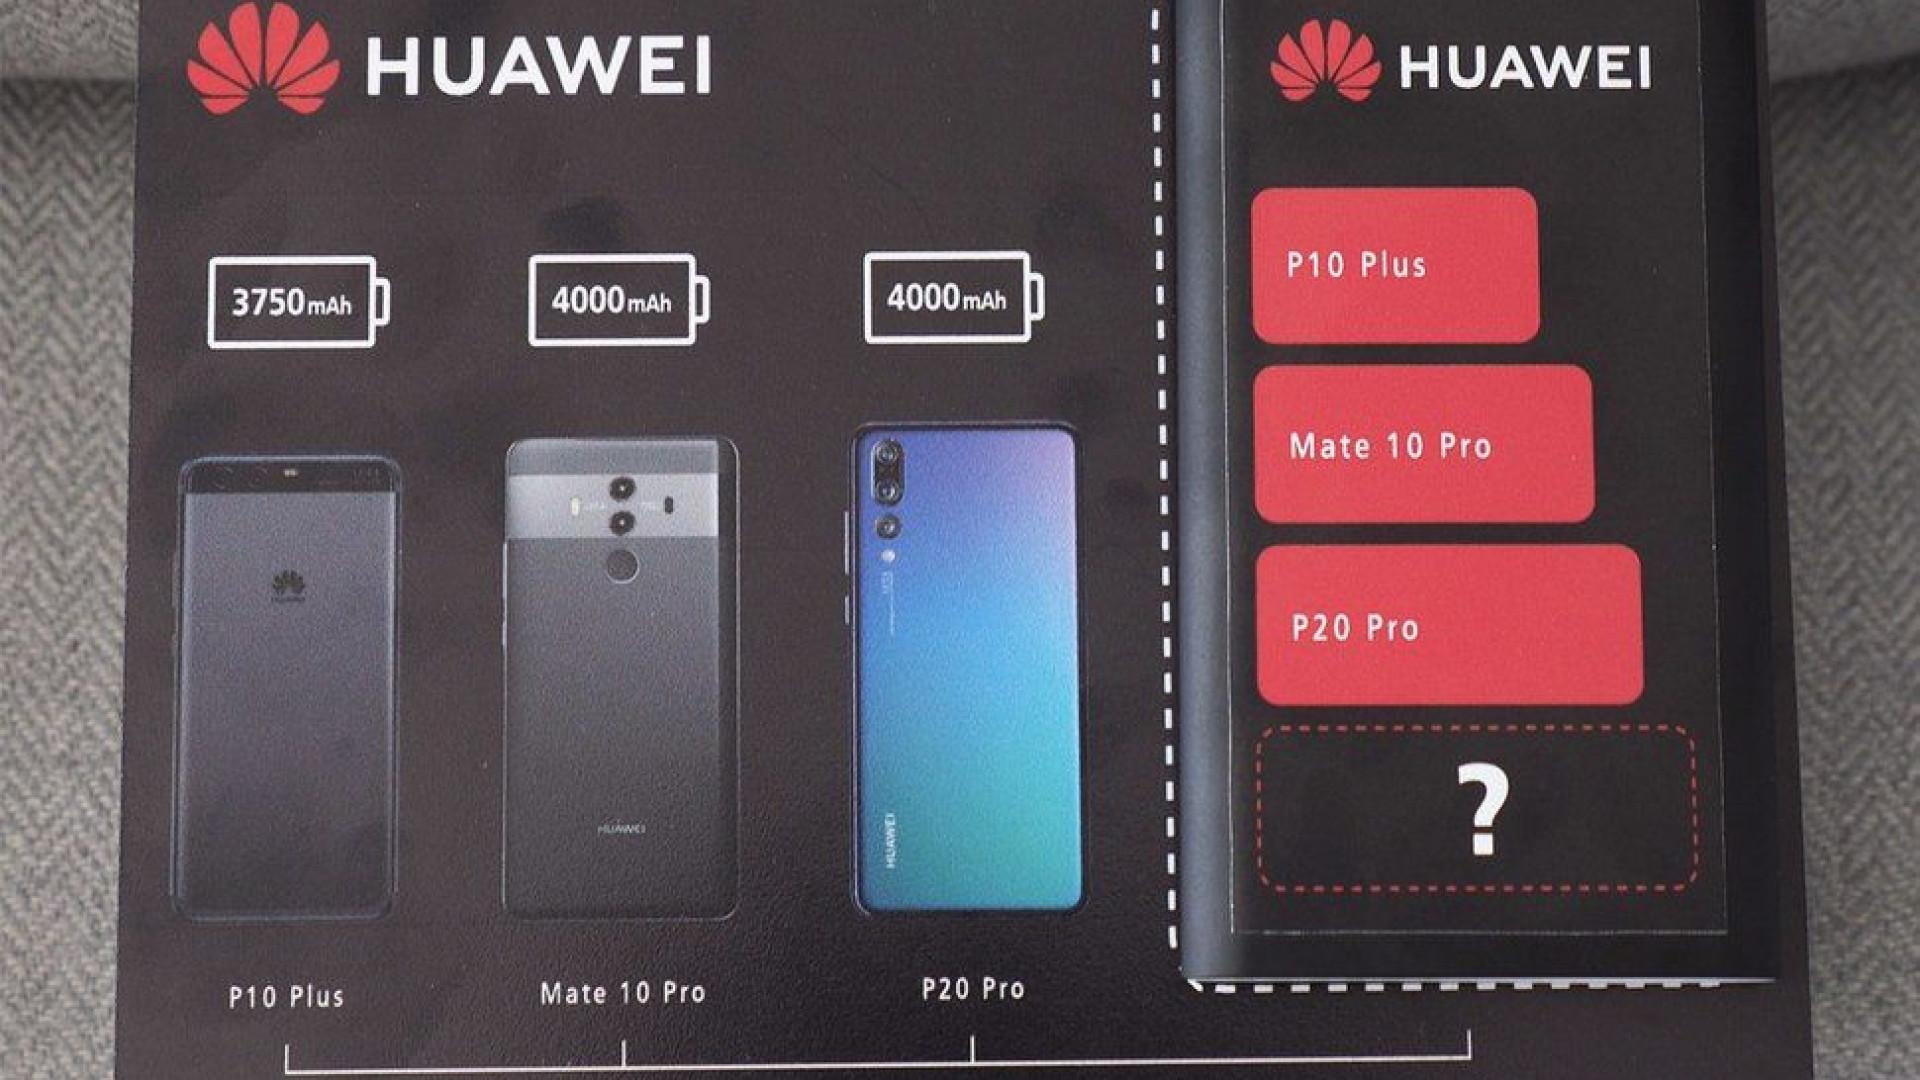 Bateria do próximo Huawei será algo nunca visto na marca